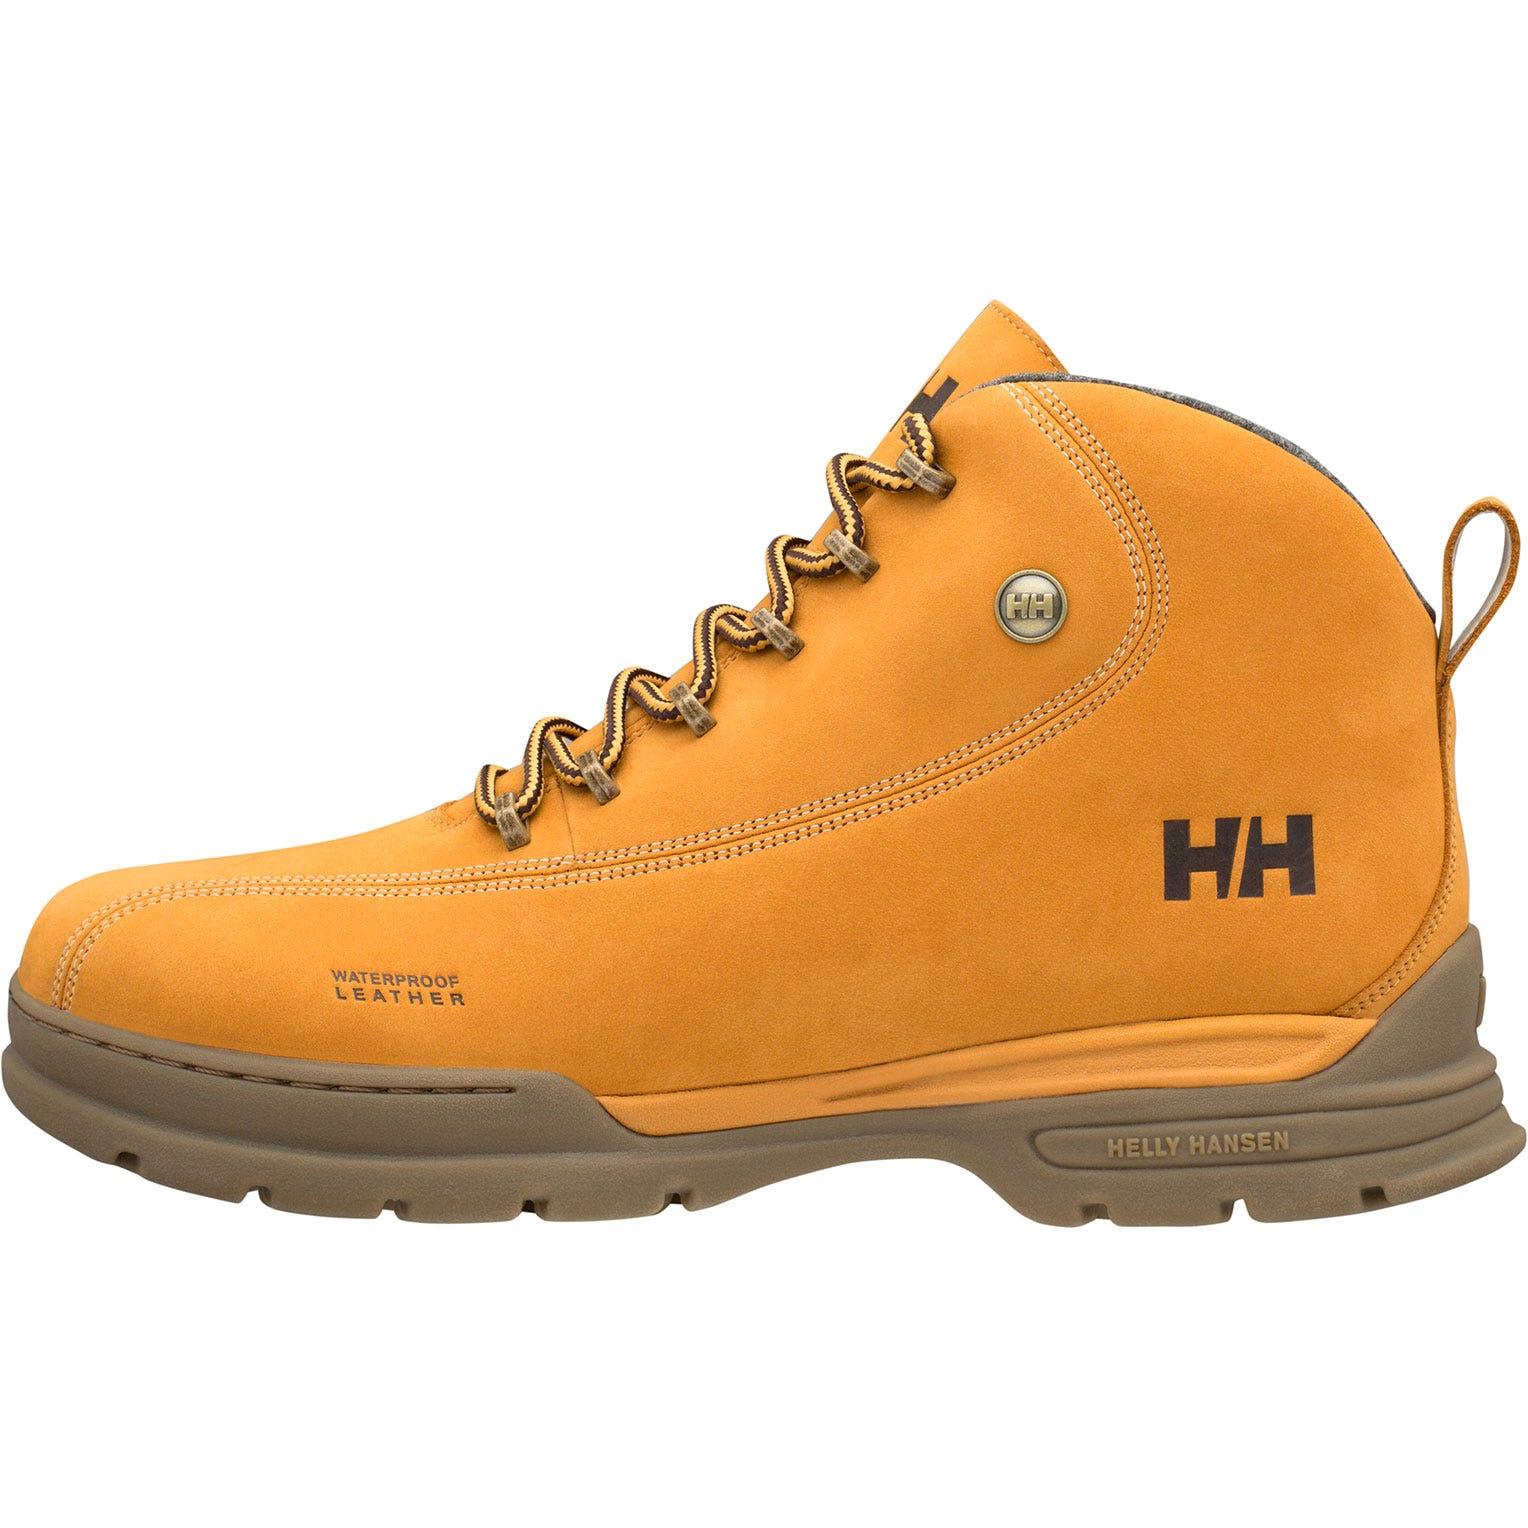 Helly Hansen Skardi Insulated Mens Winter Boot Brown 40.5/7.5